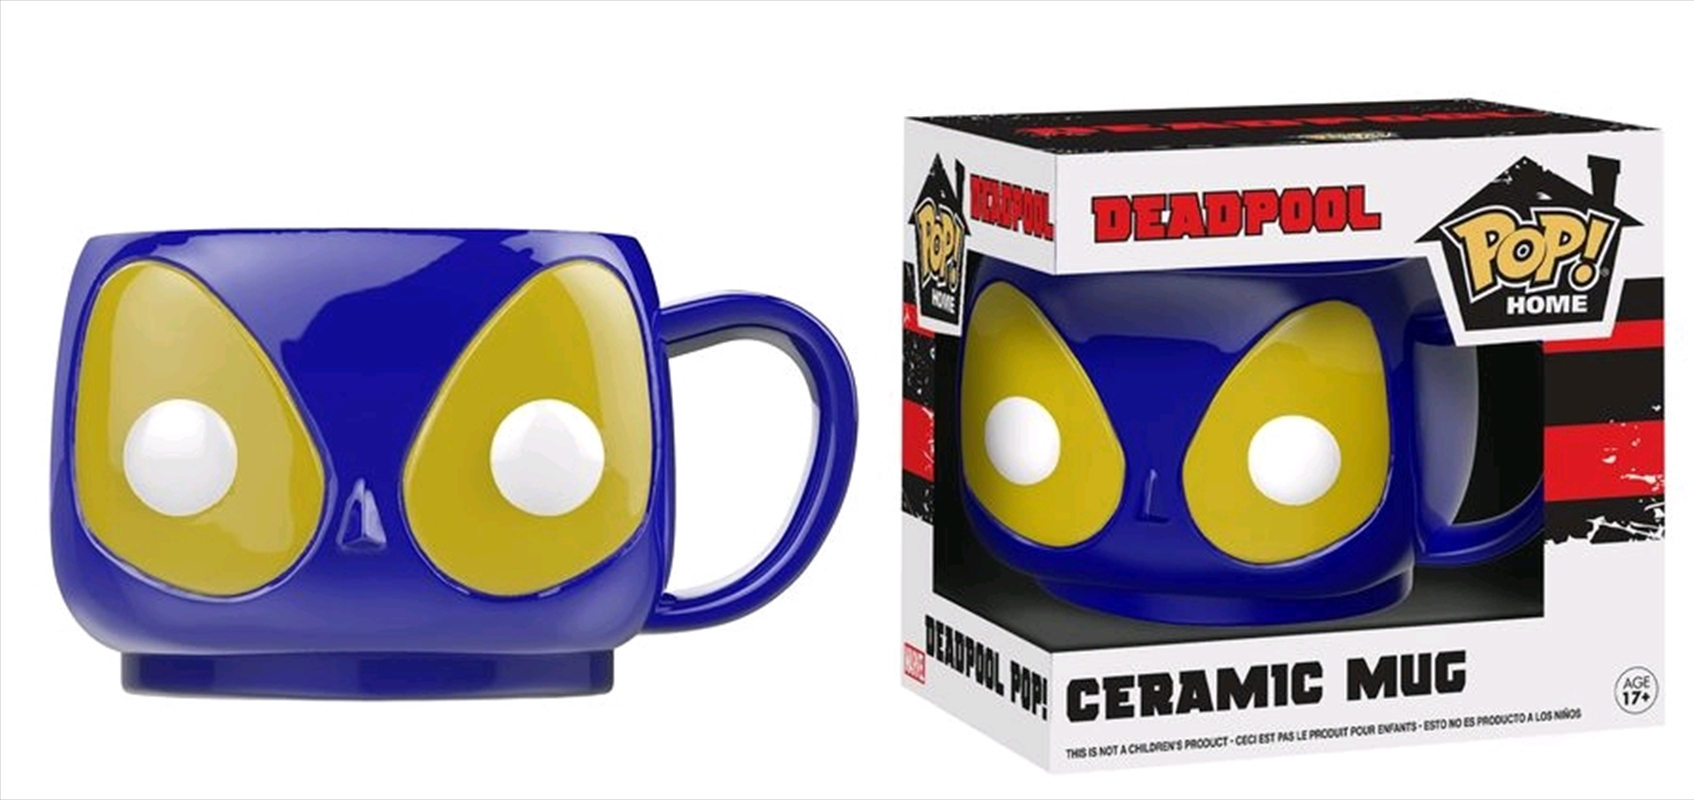 Deadpool - Deadpool Blue Pop! Mug | Merchandise